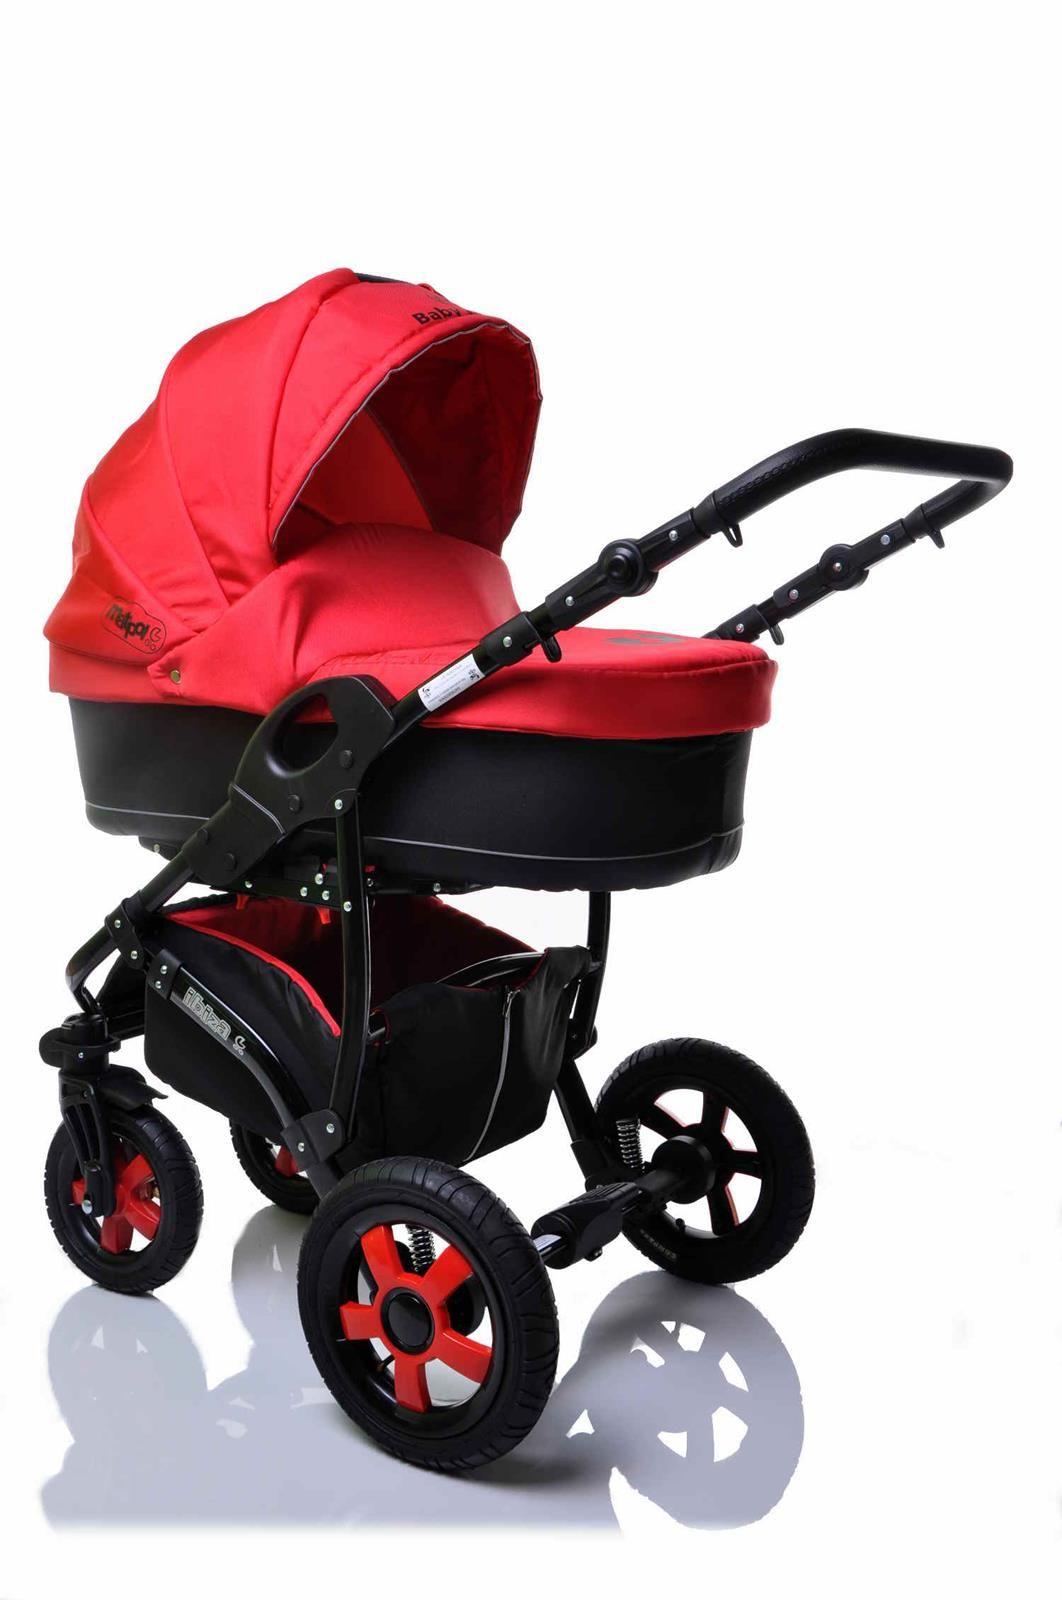 Sunbaby kombinovaný kočárek 2v1 Ibiza 2016 červená